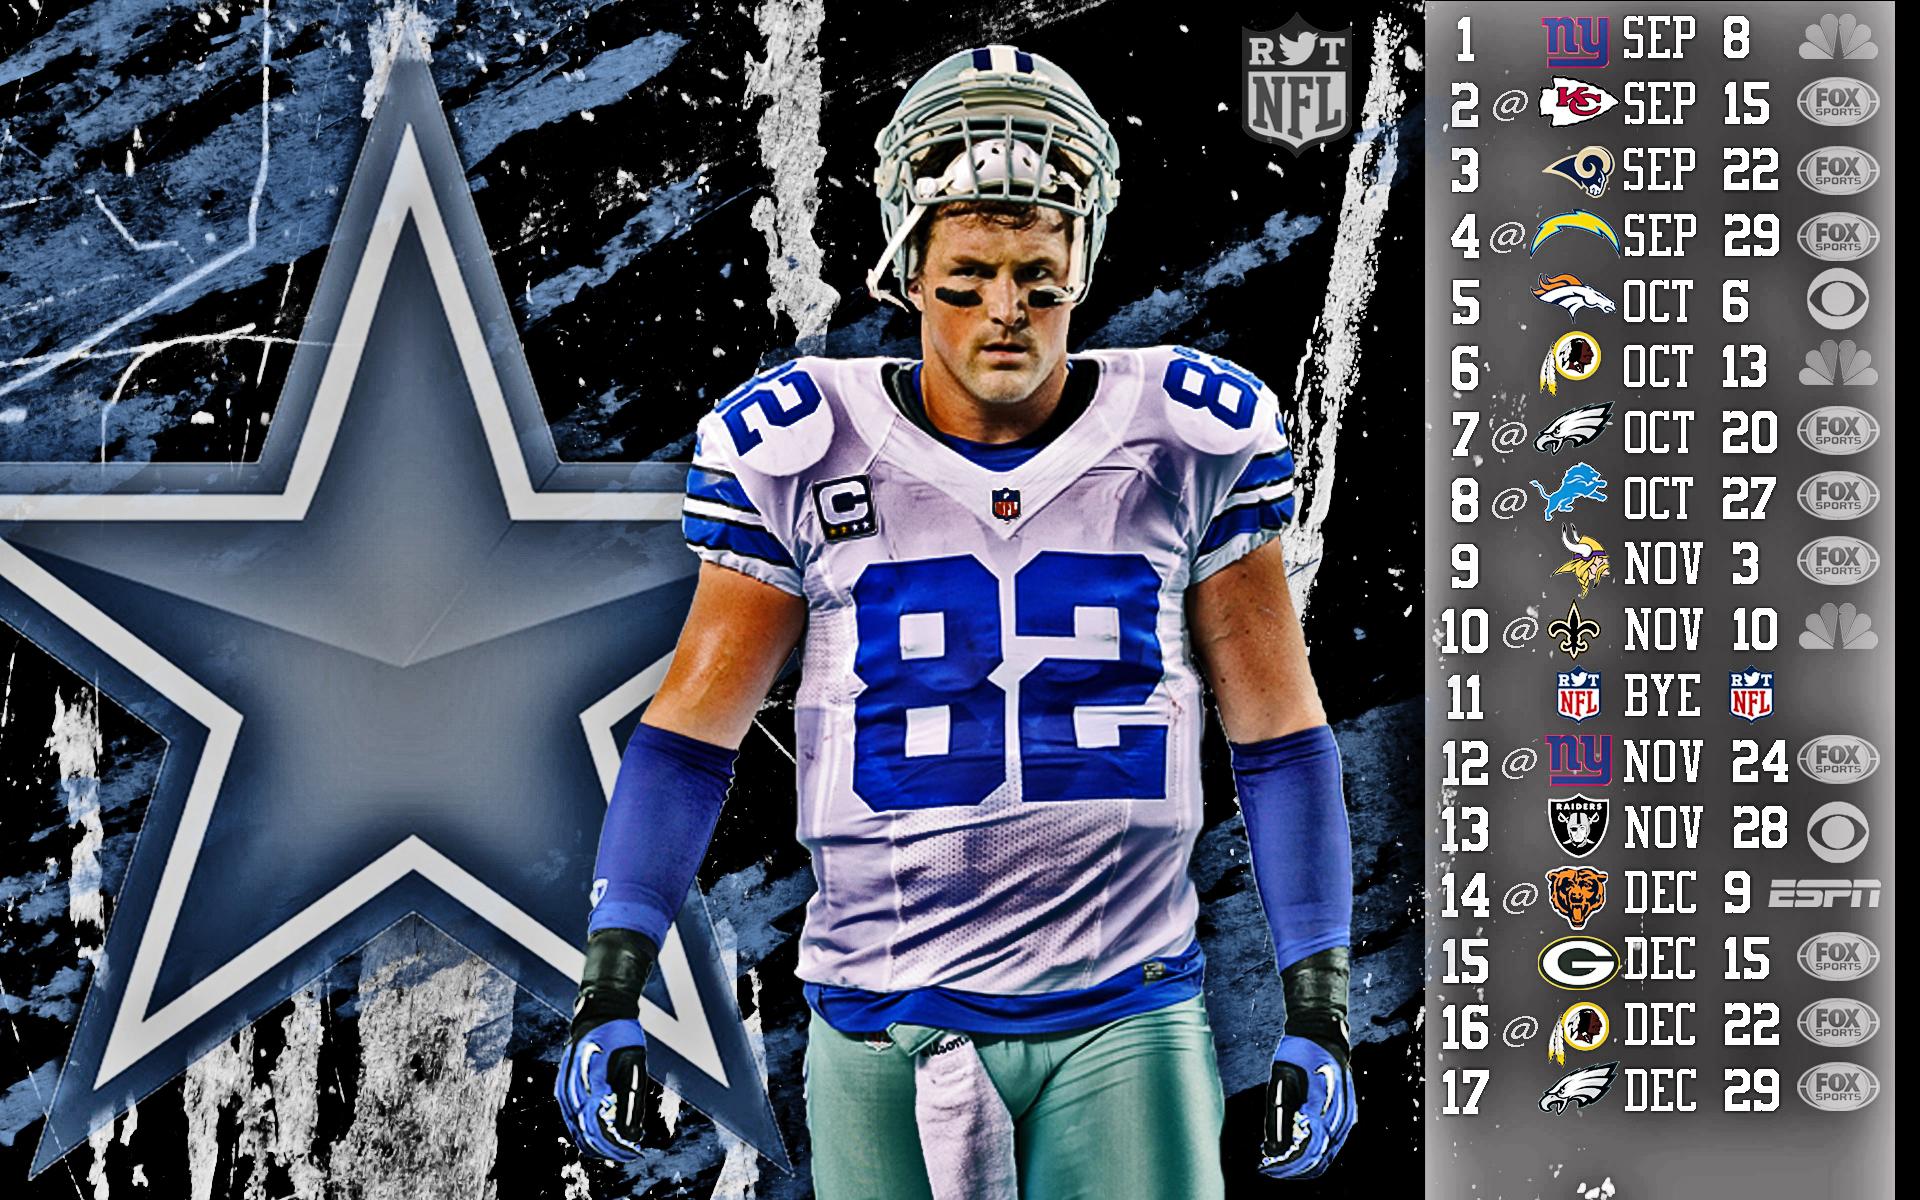 San Francisco Wallpaper Iphone 6 Dallas Cowboys Hdr Sports